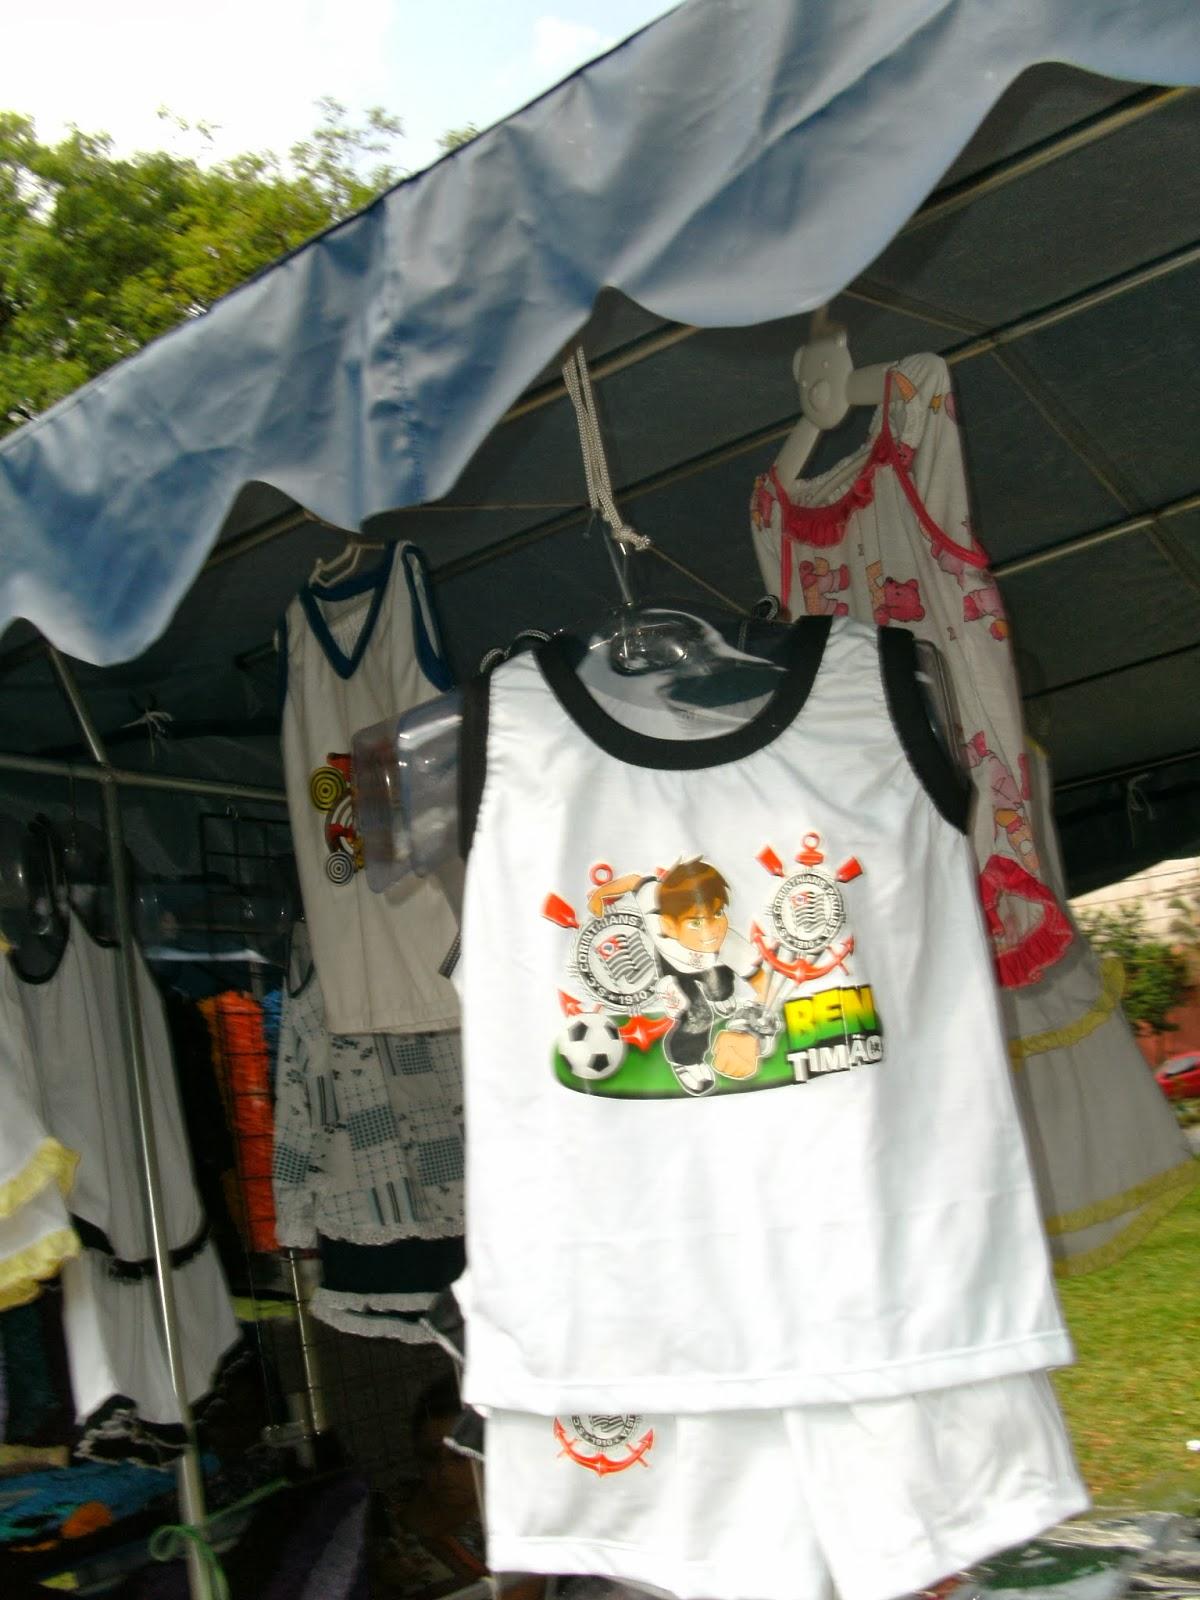 Armario Ropero Sinonimos ~ feira de artesanato em Sorocaba CAMISETAS PERSONALIZADAS PIJAMAS